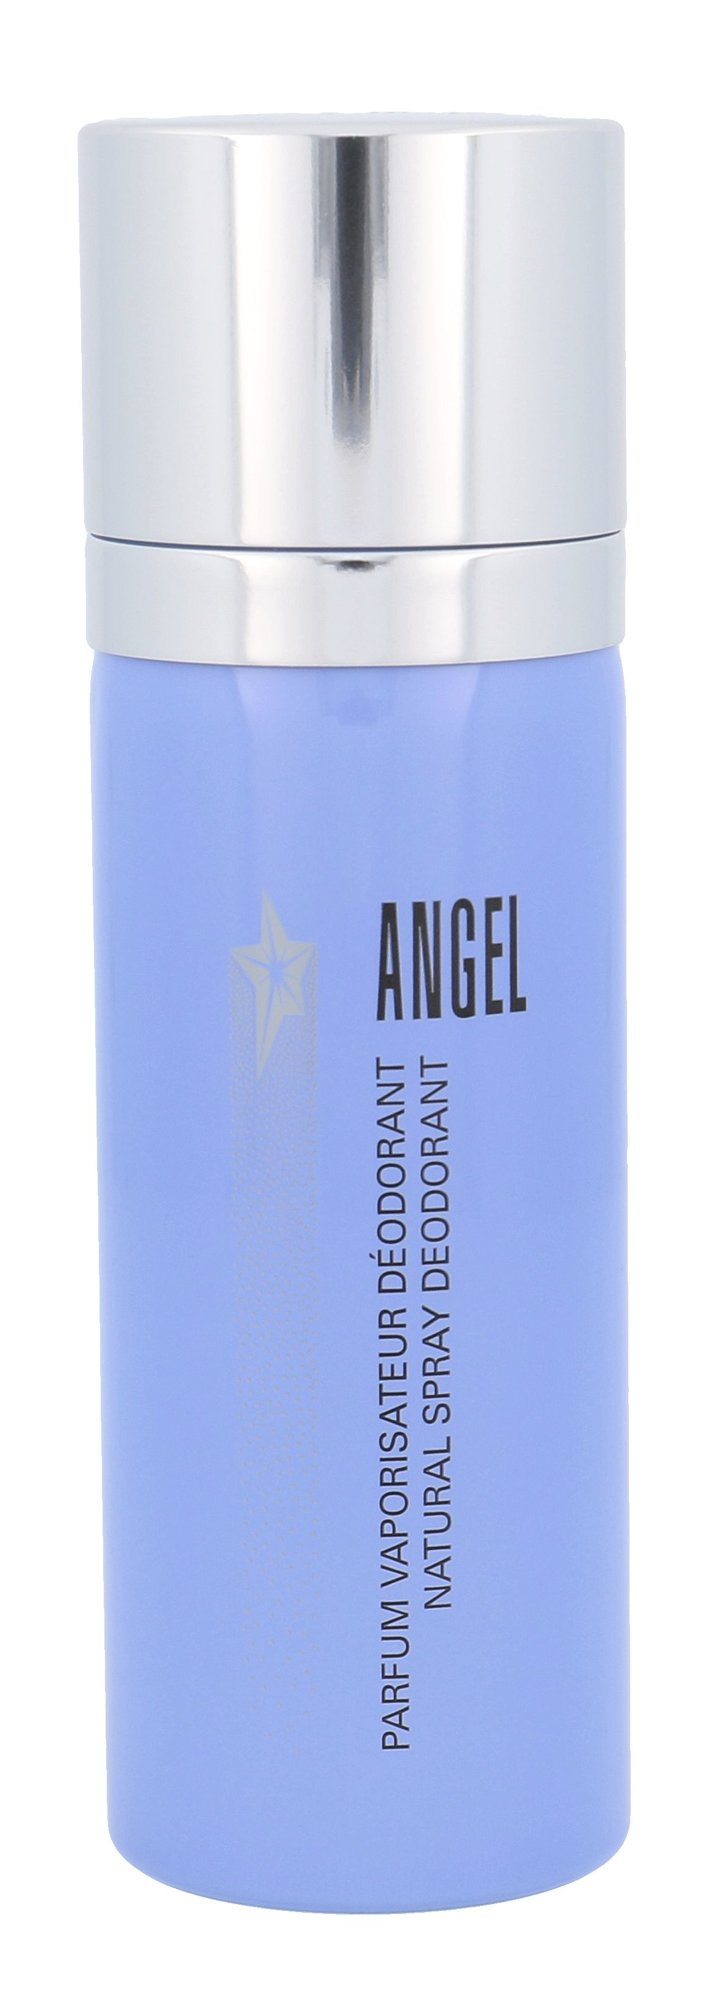 Thierry Mugler Angel Deodorant 100ml